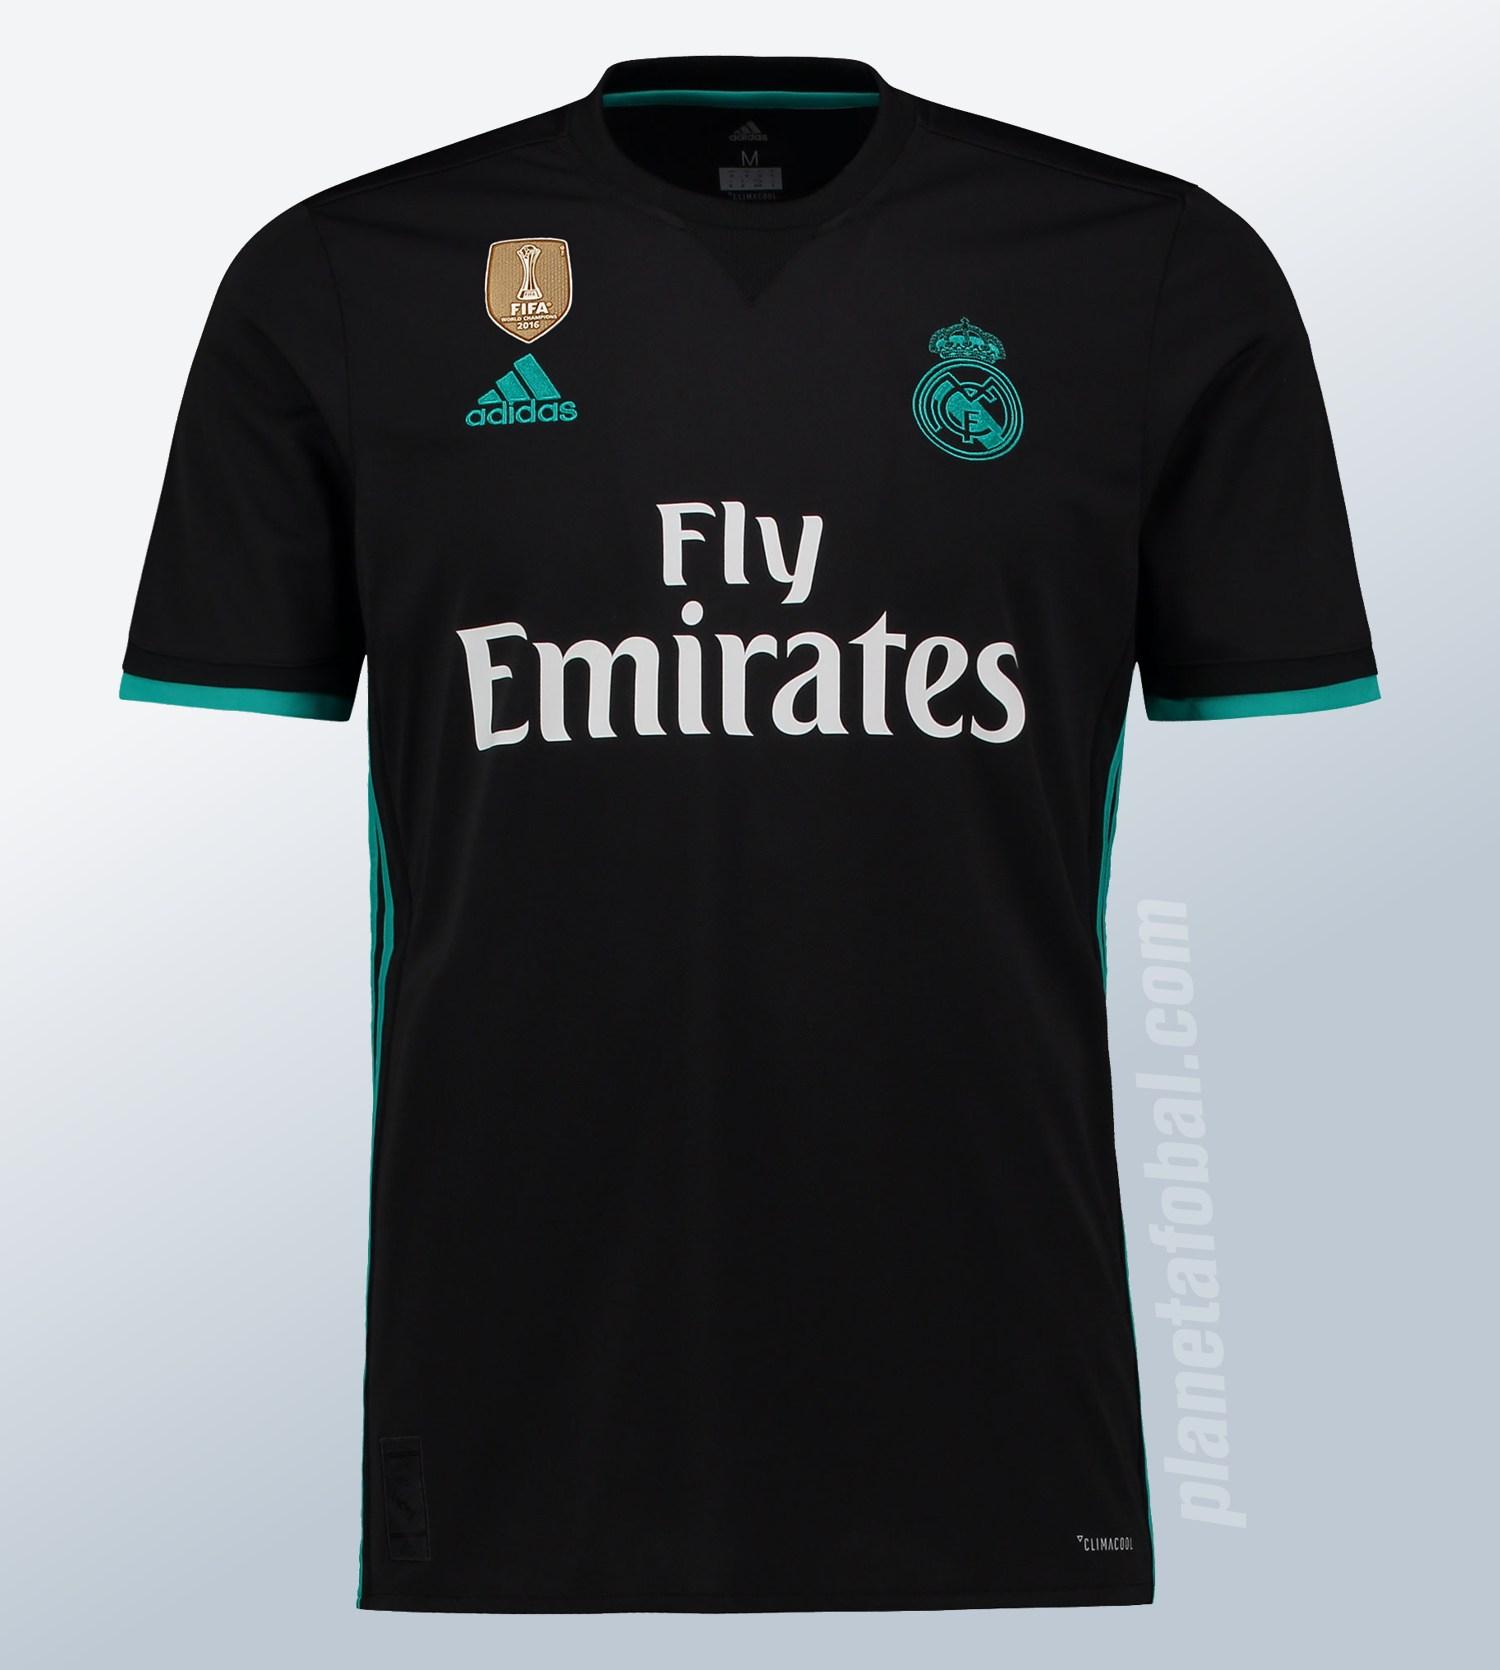 1af276317e9a2 Camiseta suplente Adidas del Real Madrid 2017 2018